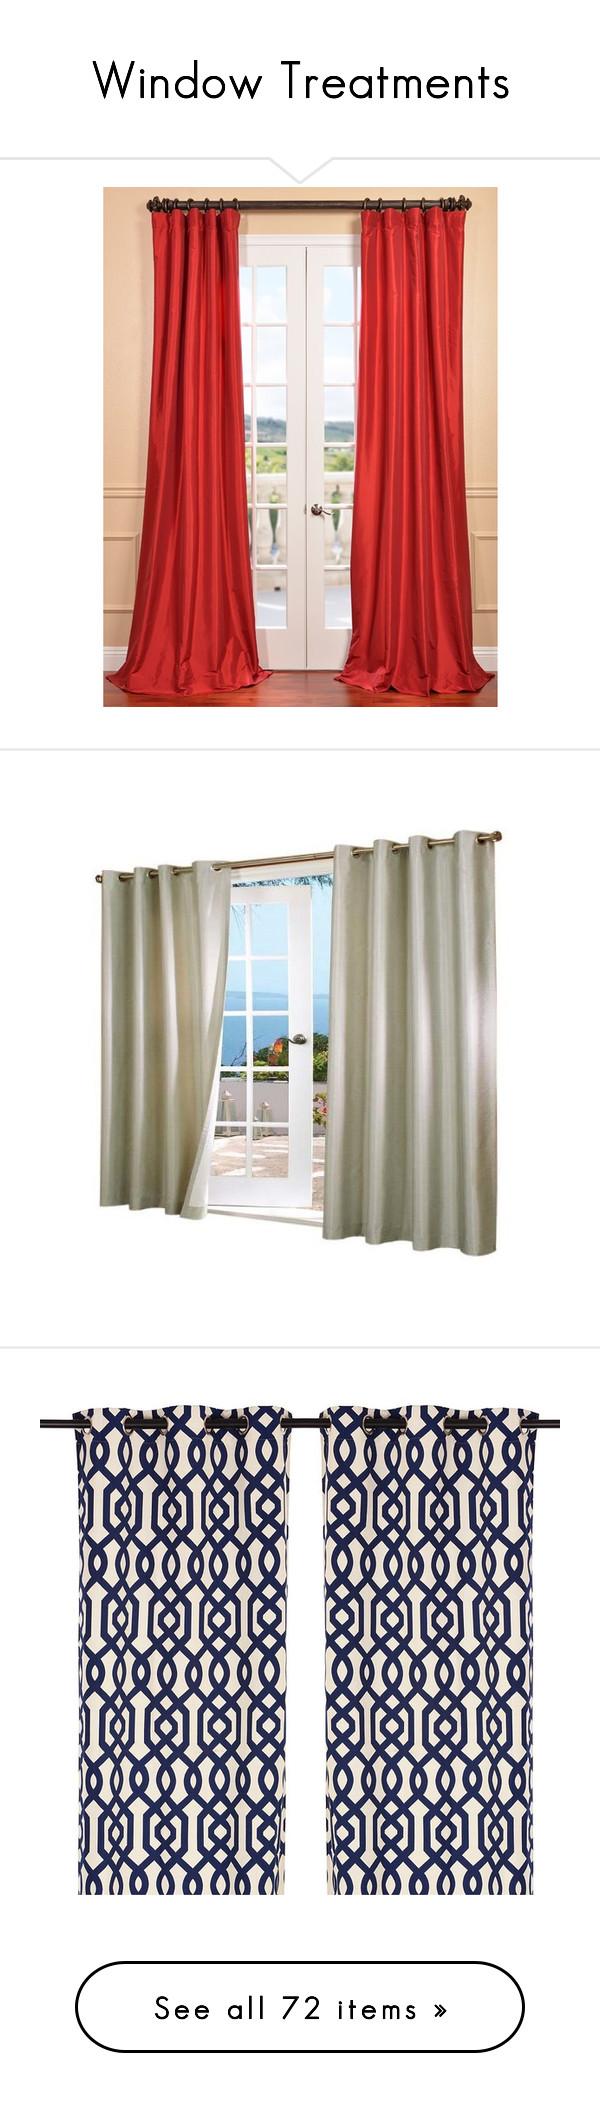 Home decor window  window treatments